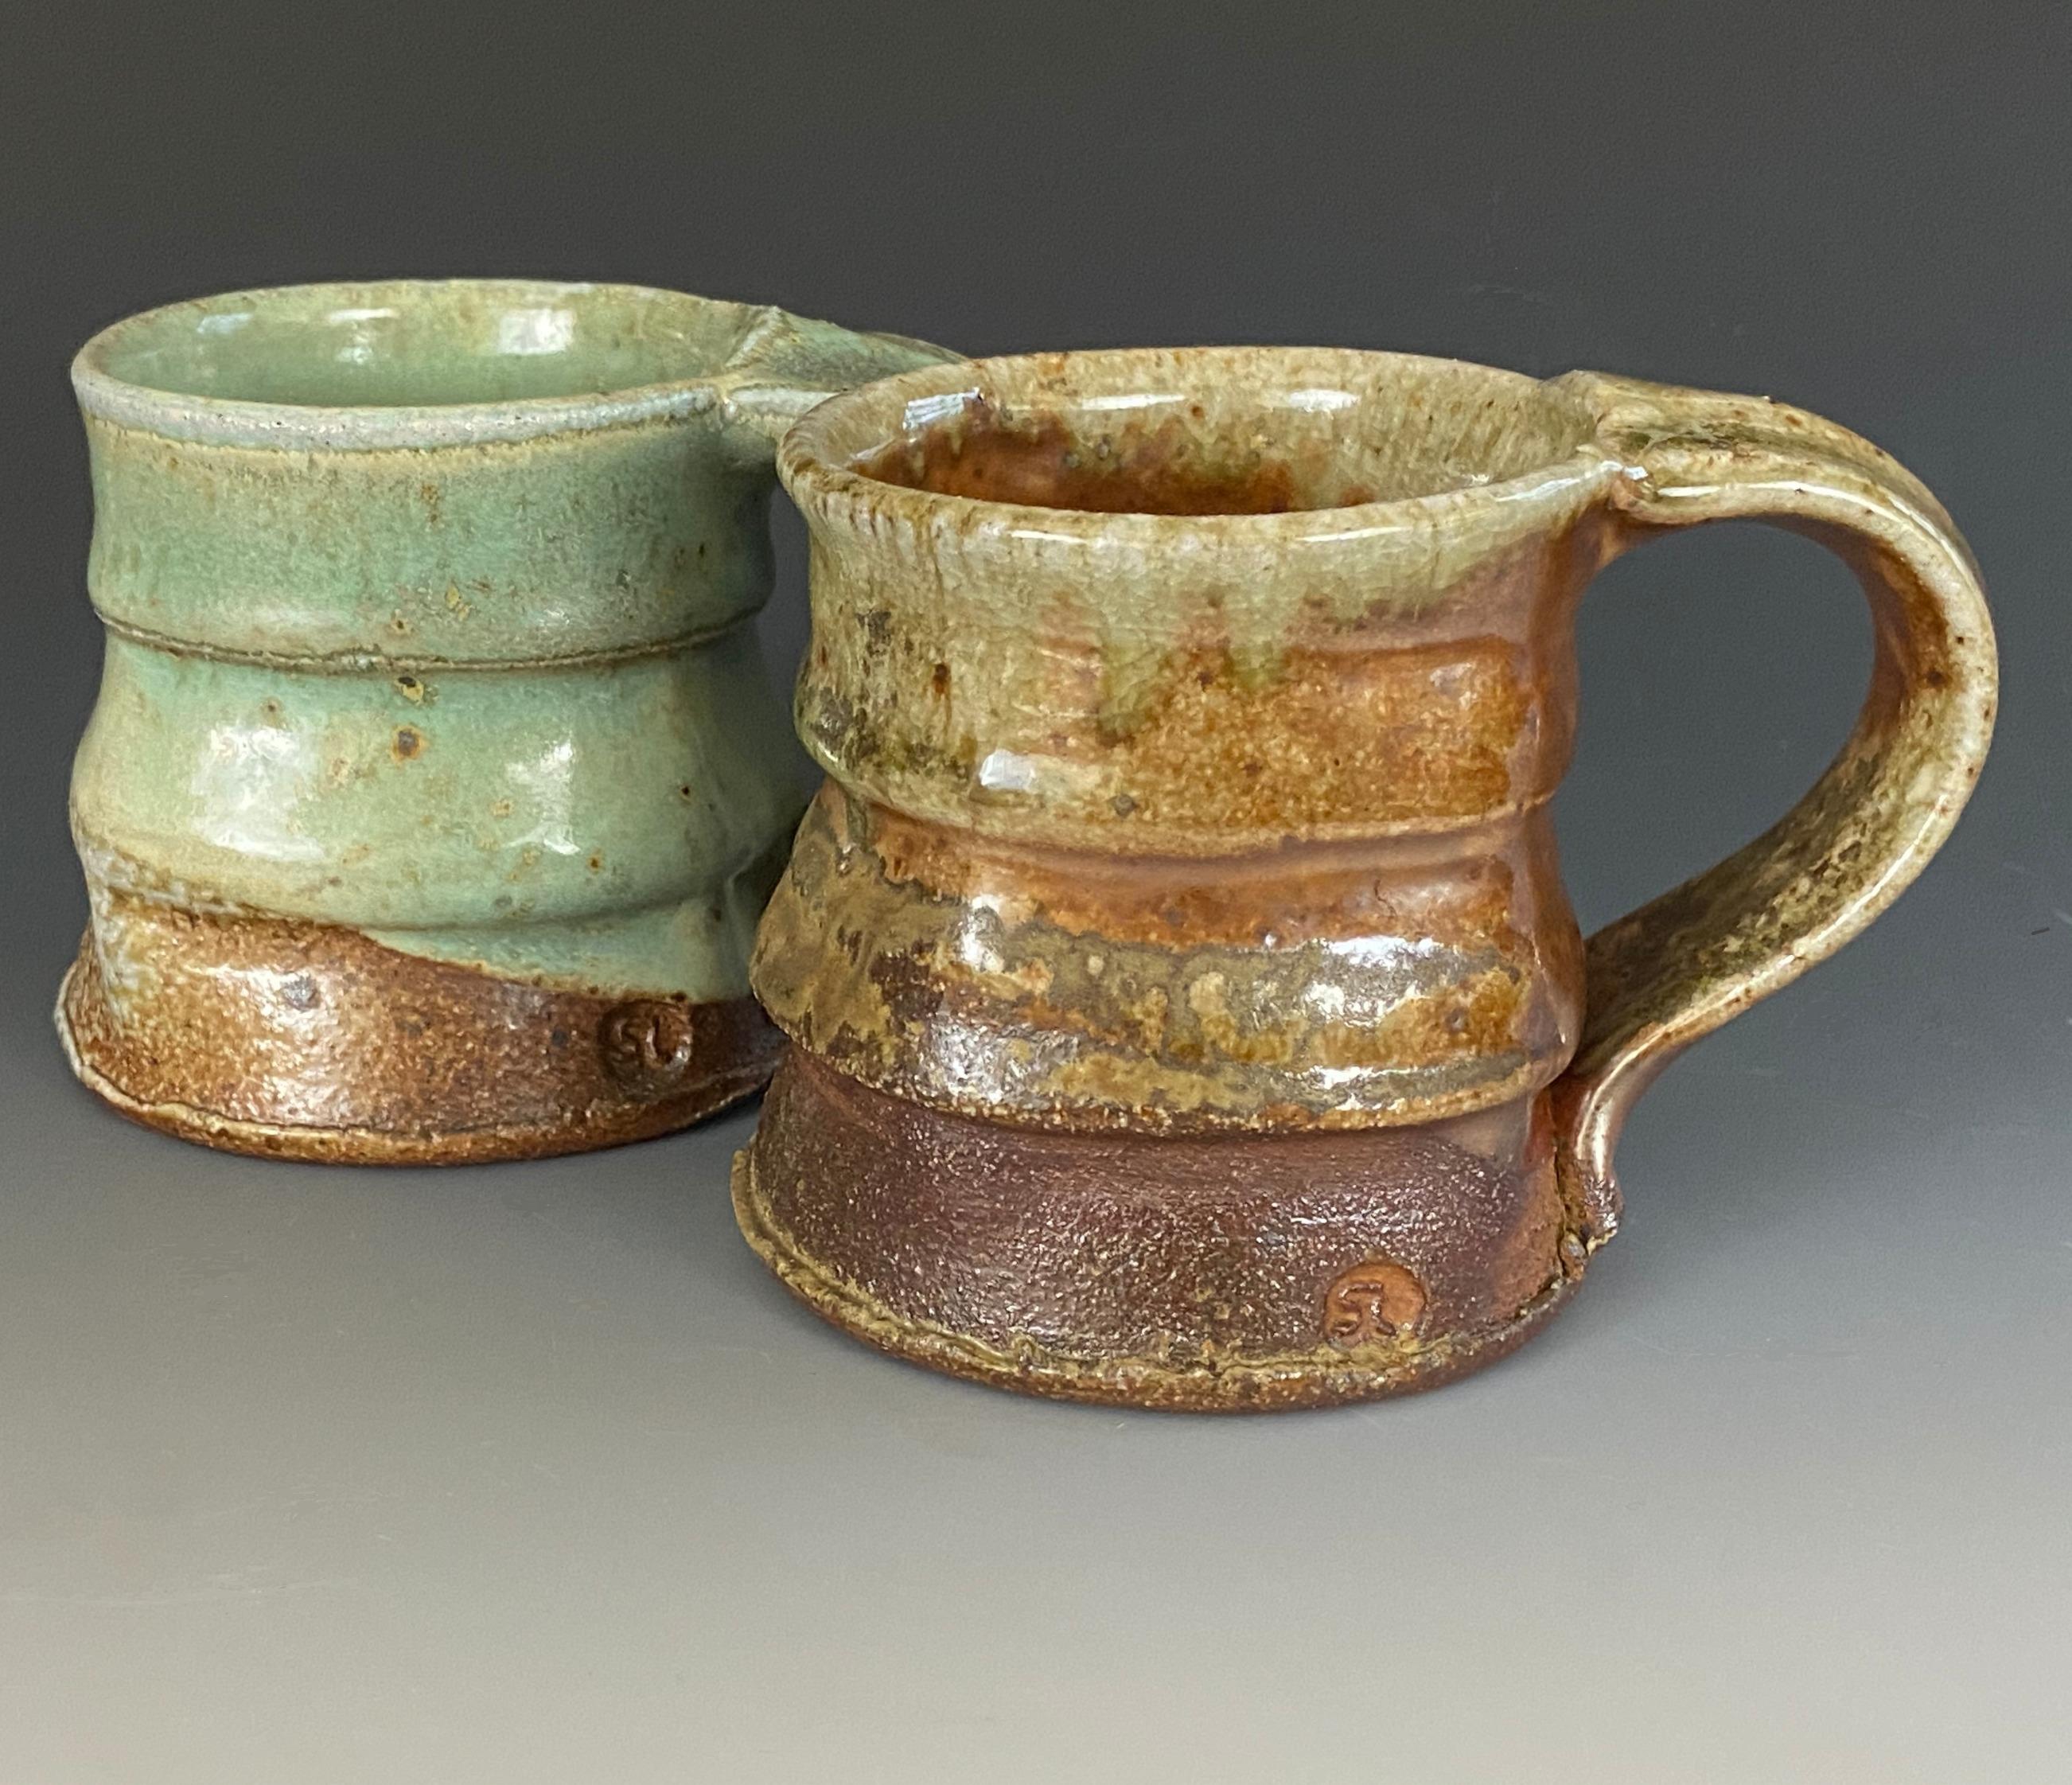 Stephen Lally Pottery